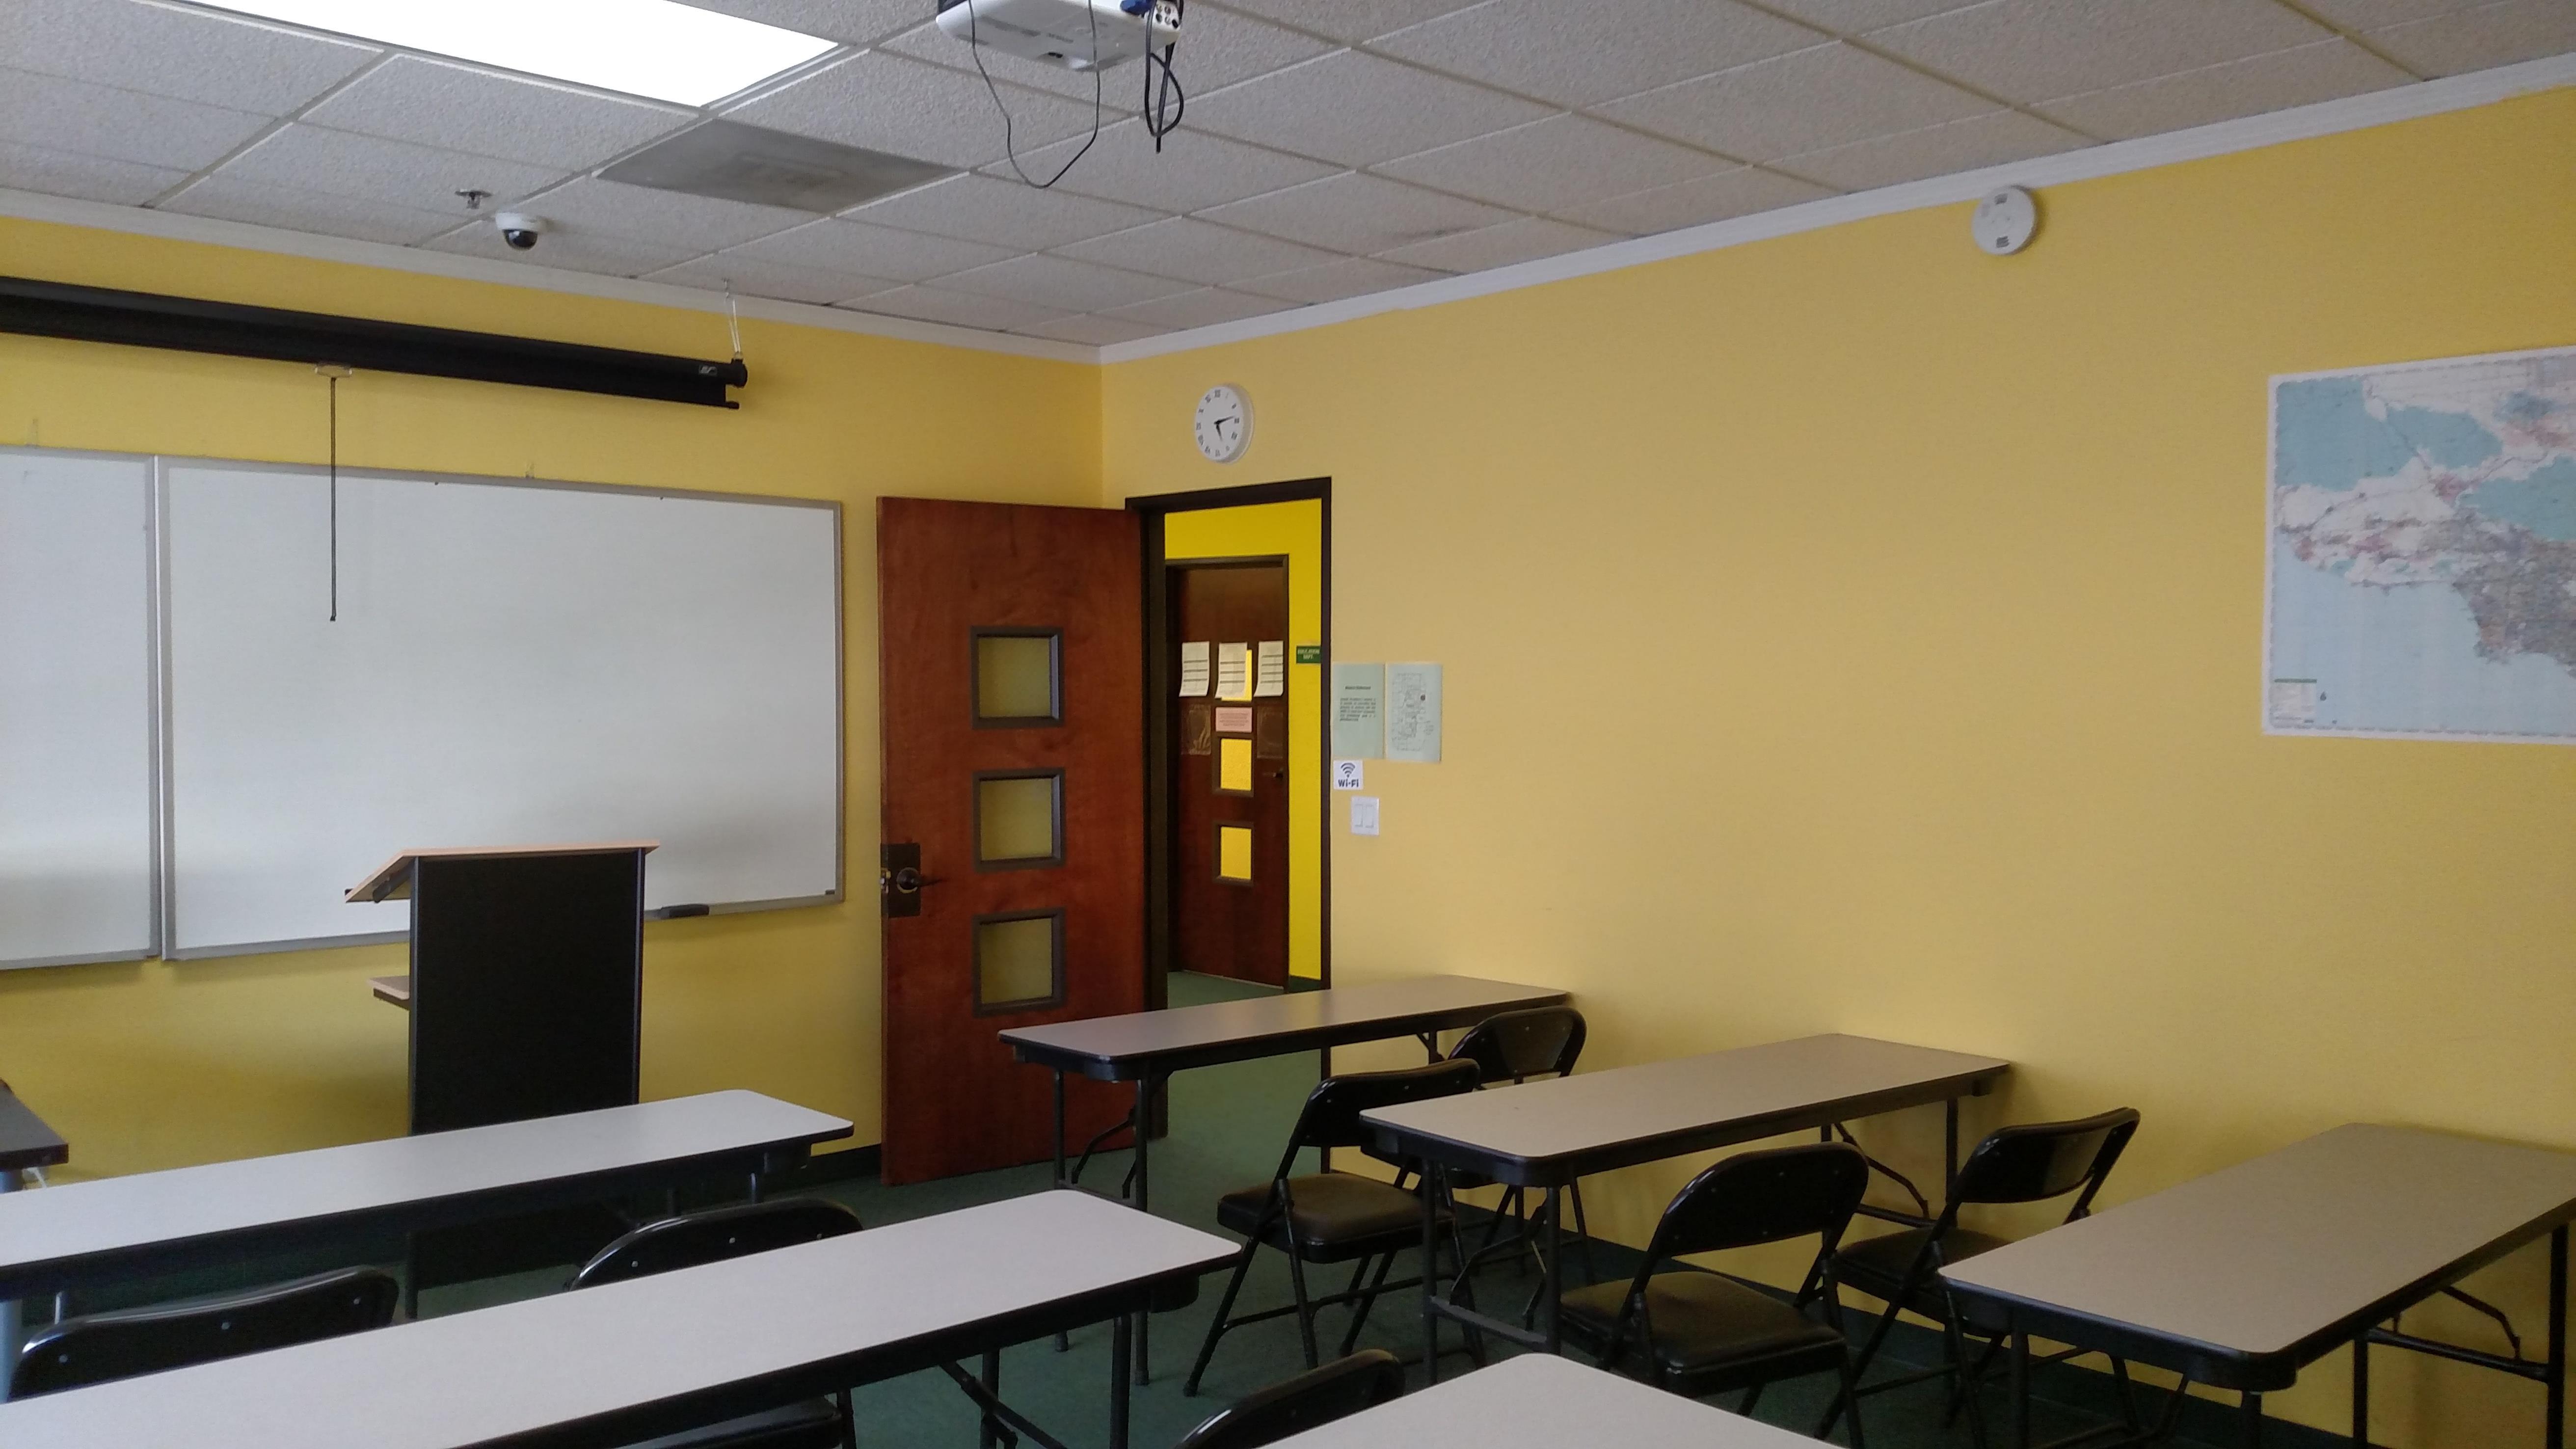 Learnet Academy, Inc. - Meeting Room 8